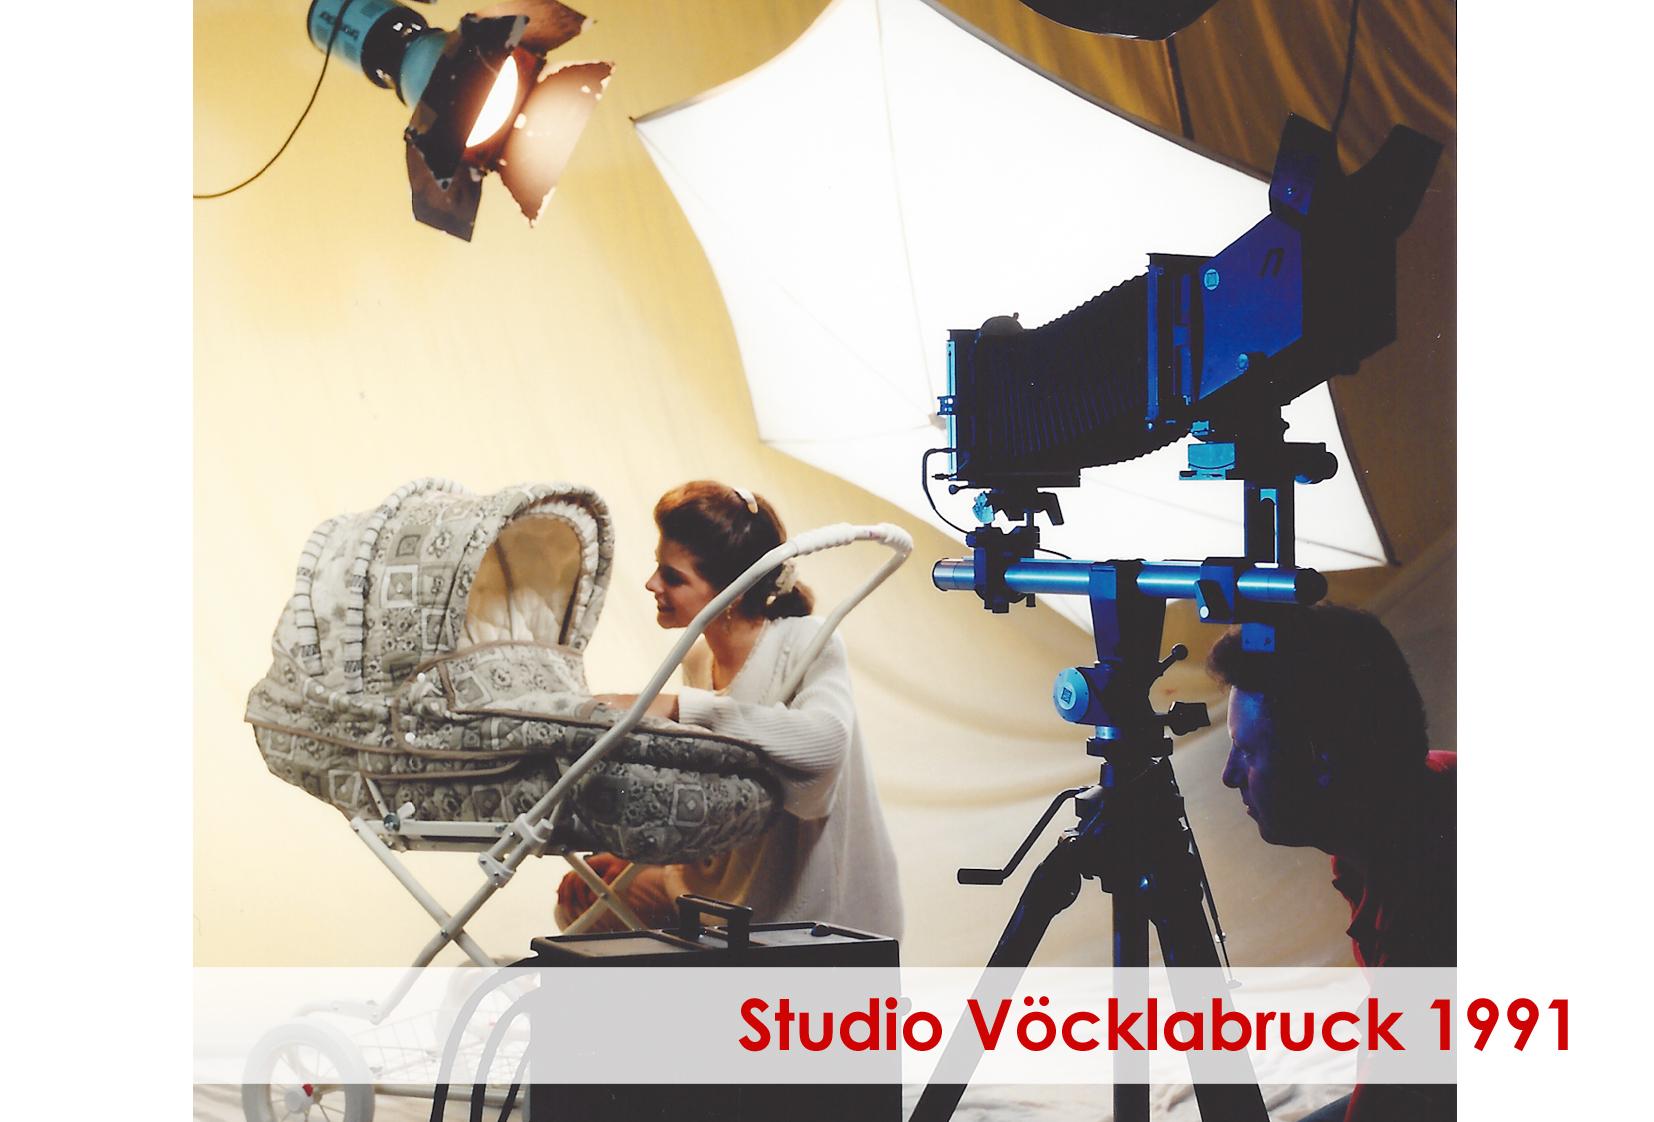 Resch Studio in Vöcklabruck